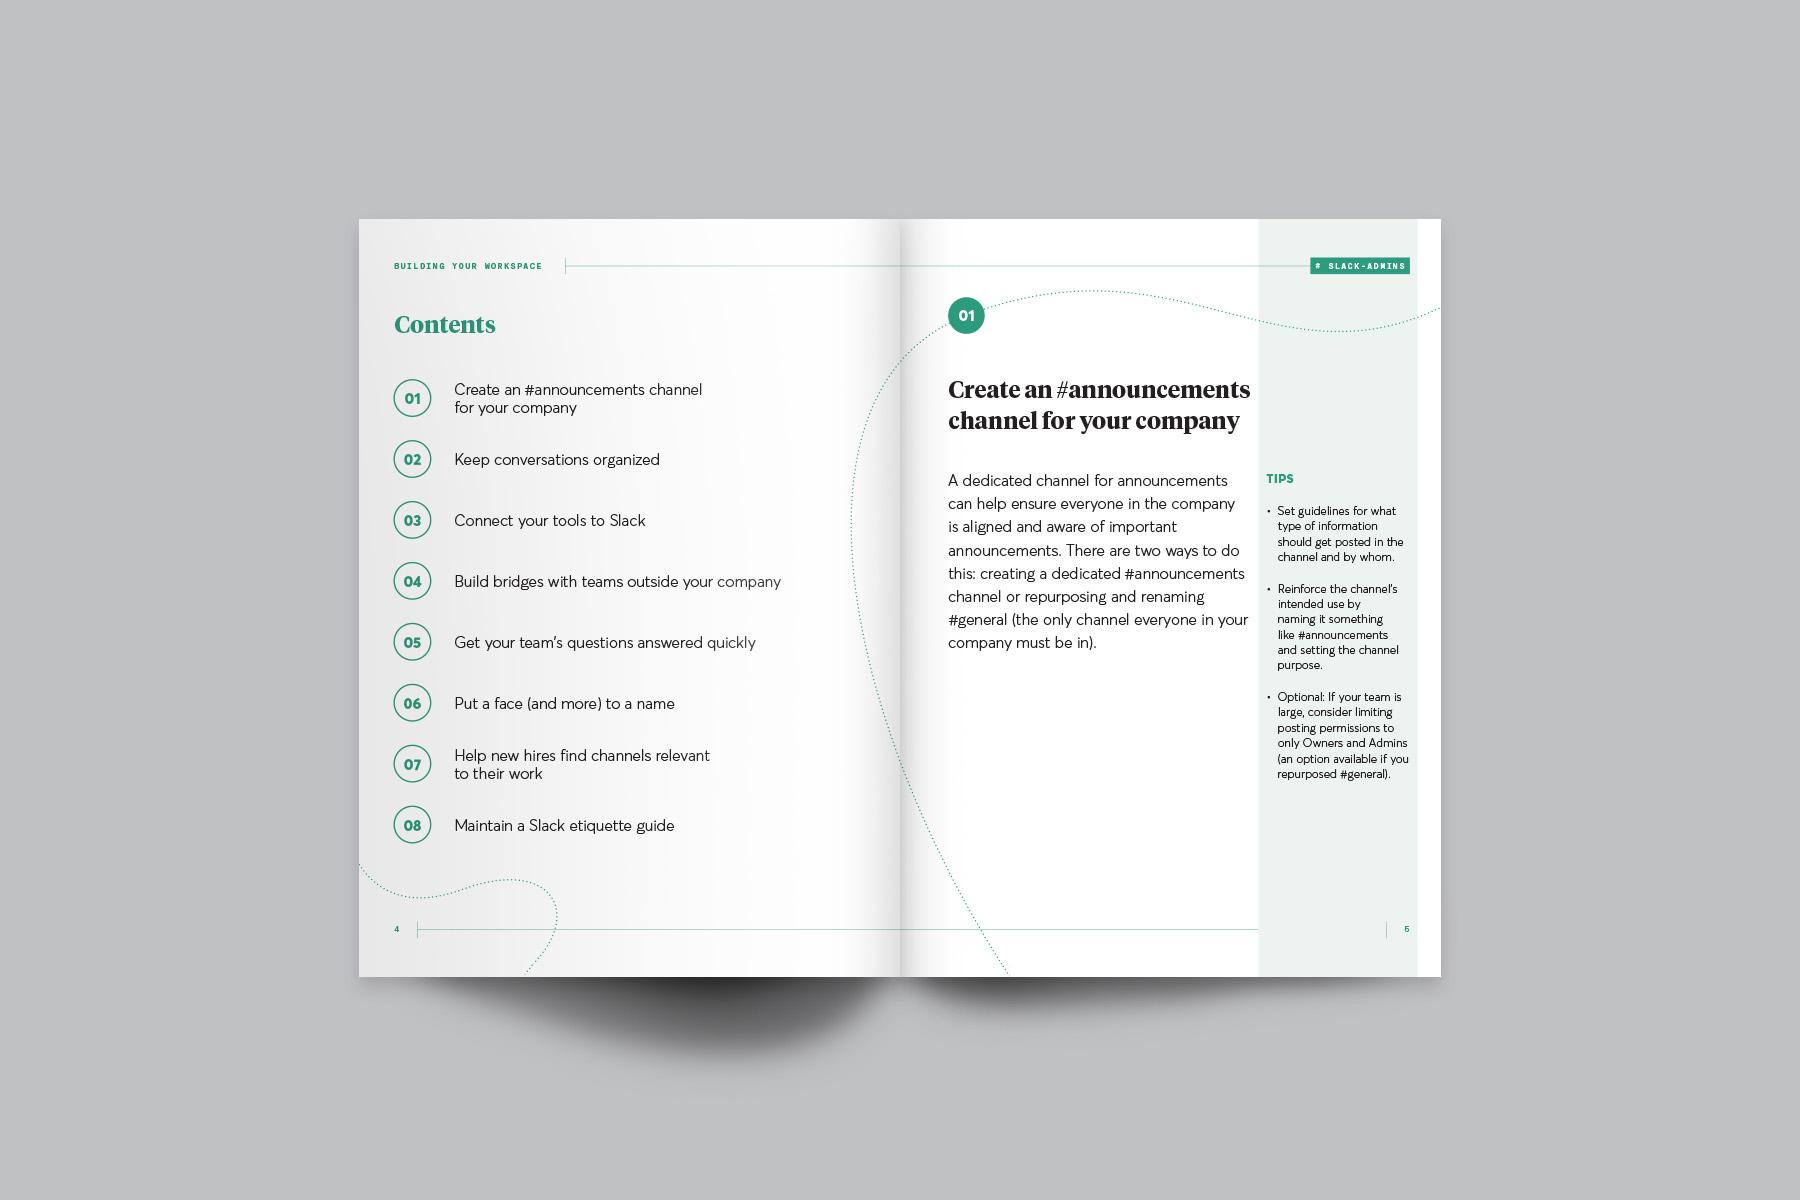 adminbook-print-mockup-2.jpg